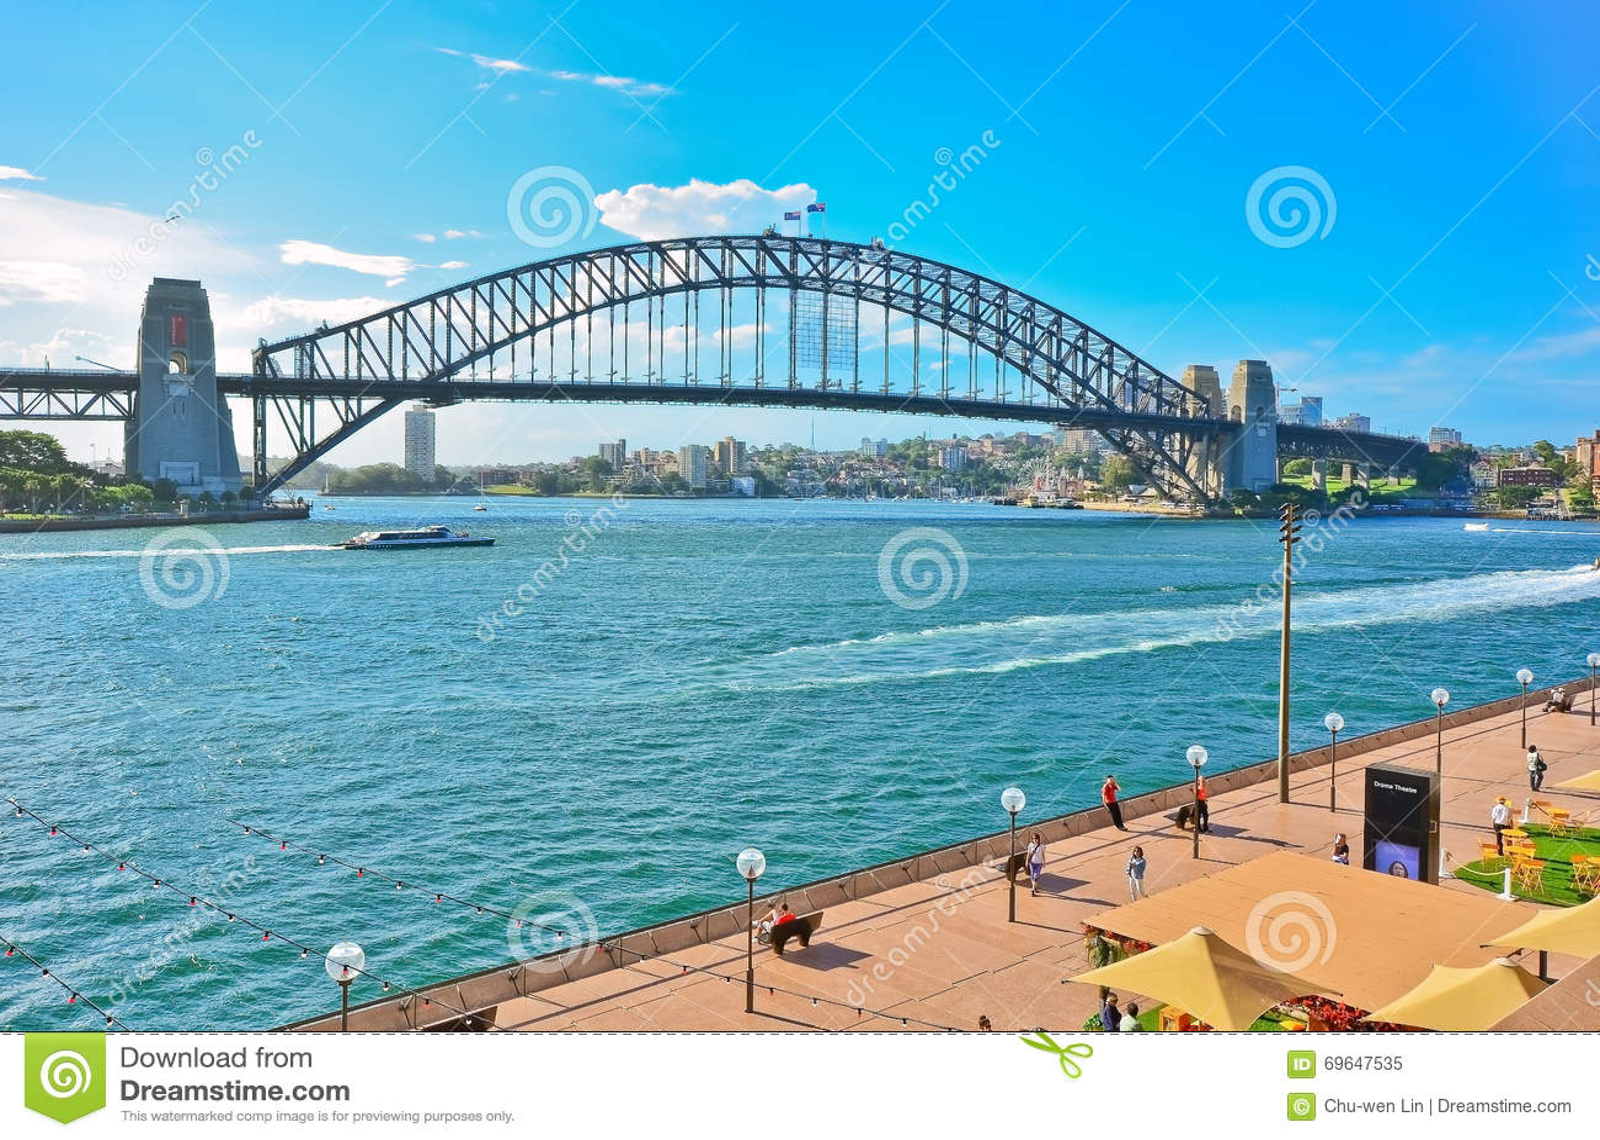 Arbor day date in Sydney